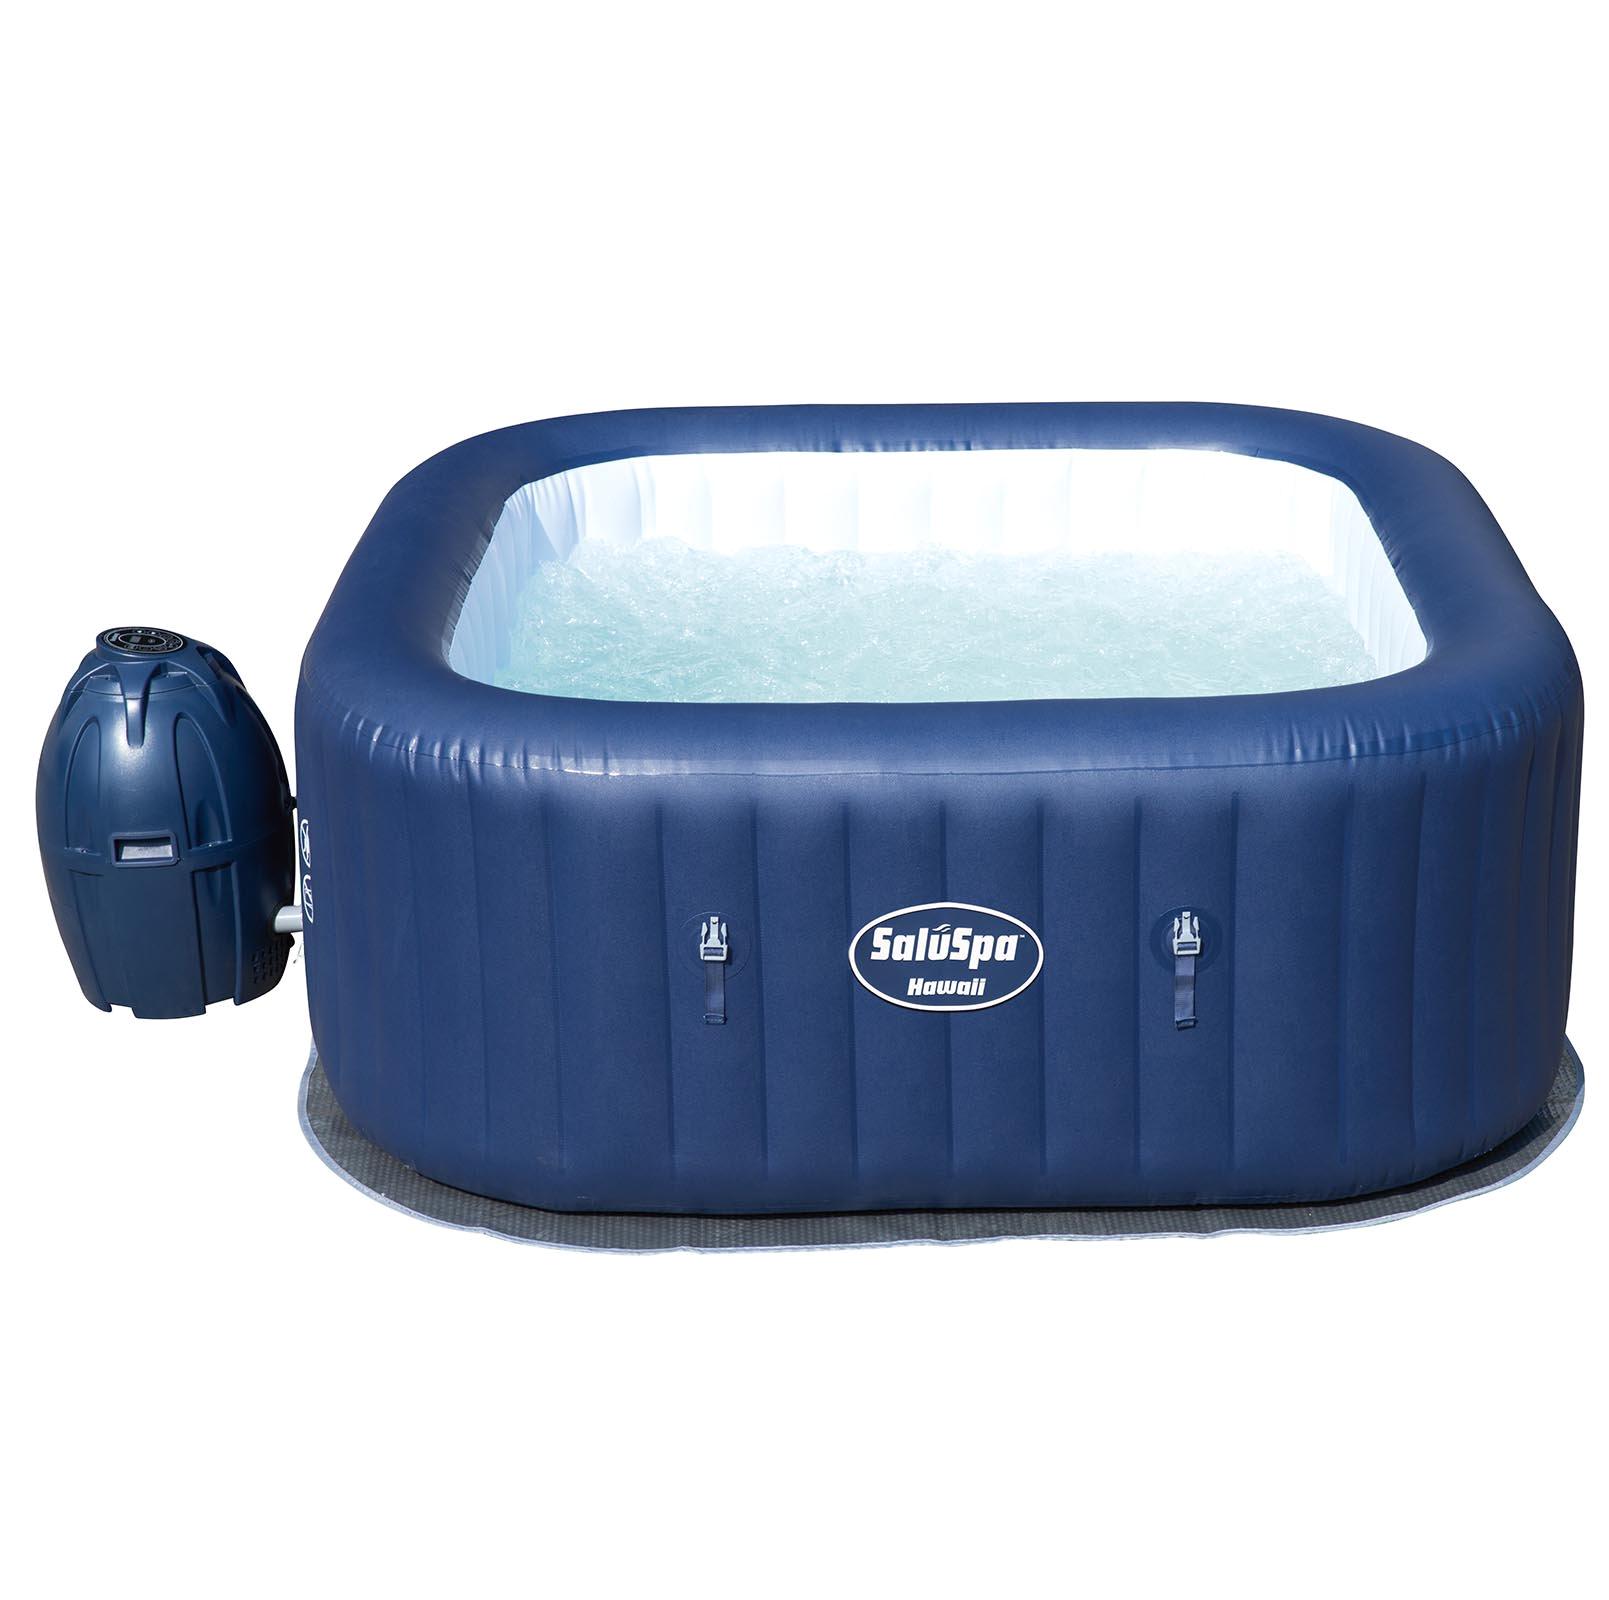 Best Portable Bathtub Jacuzzi Bestway Saluspa Hawaii Airjet 6 Portable Inflatable Spa